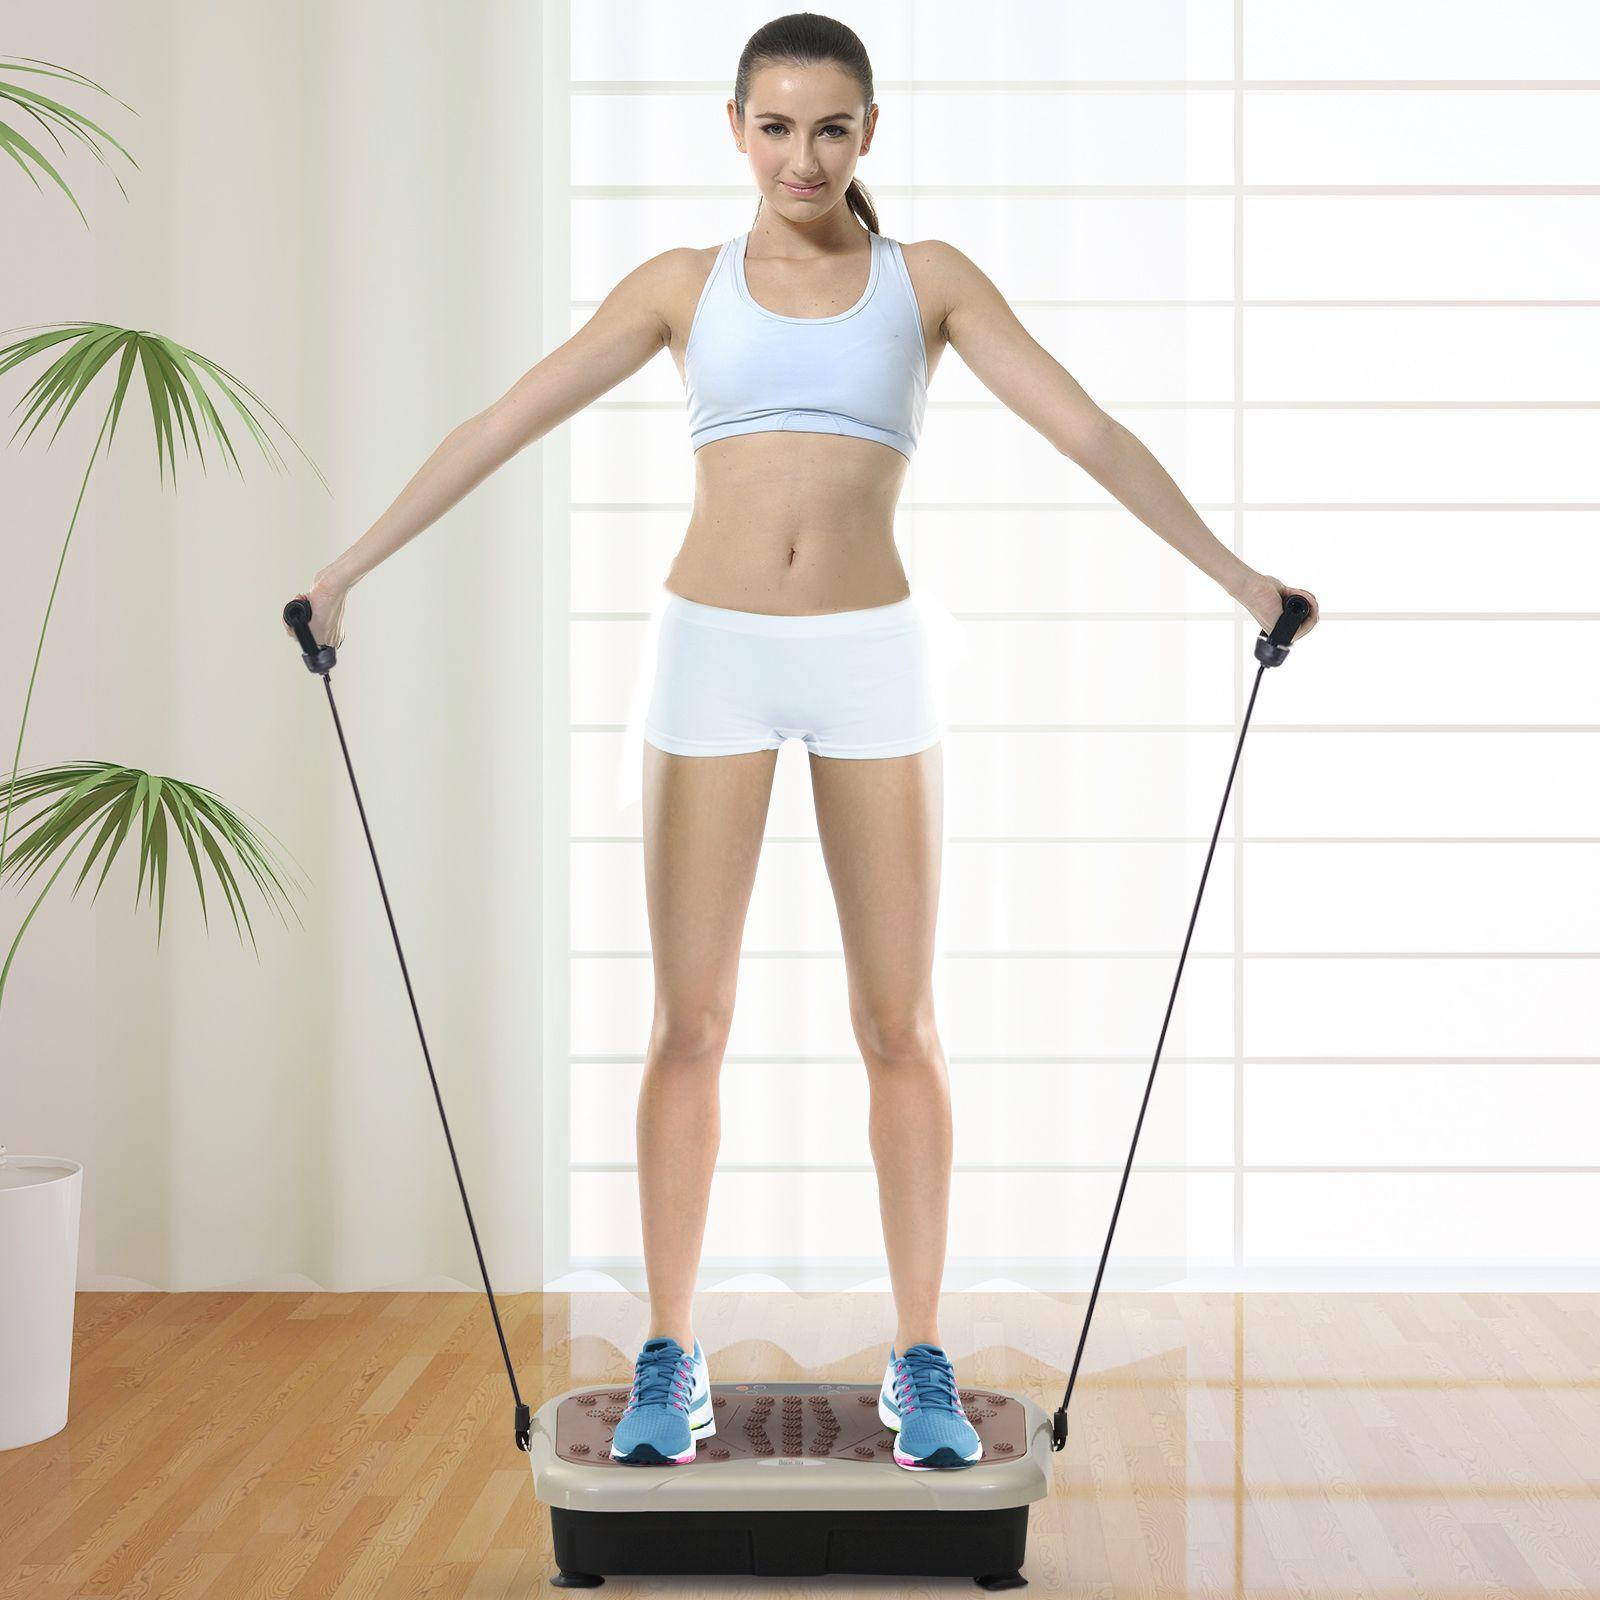 Jolitec® Plataforma Vibradora con 2 Bandas Elásticas para Fitness Entrenamiento